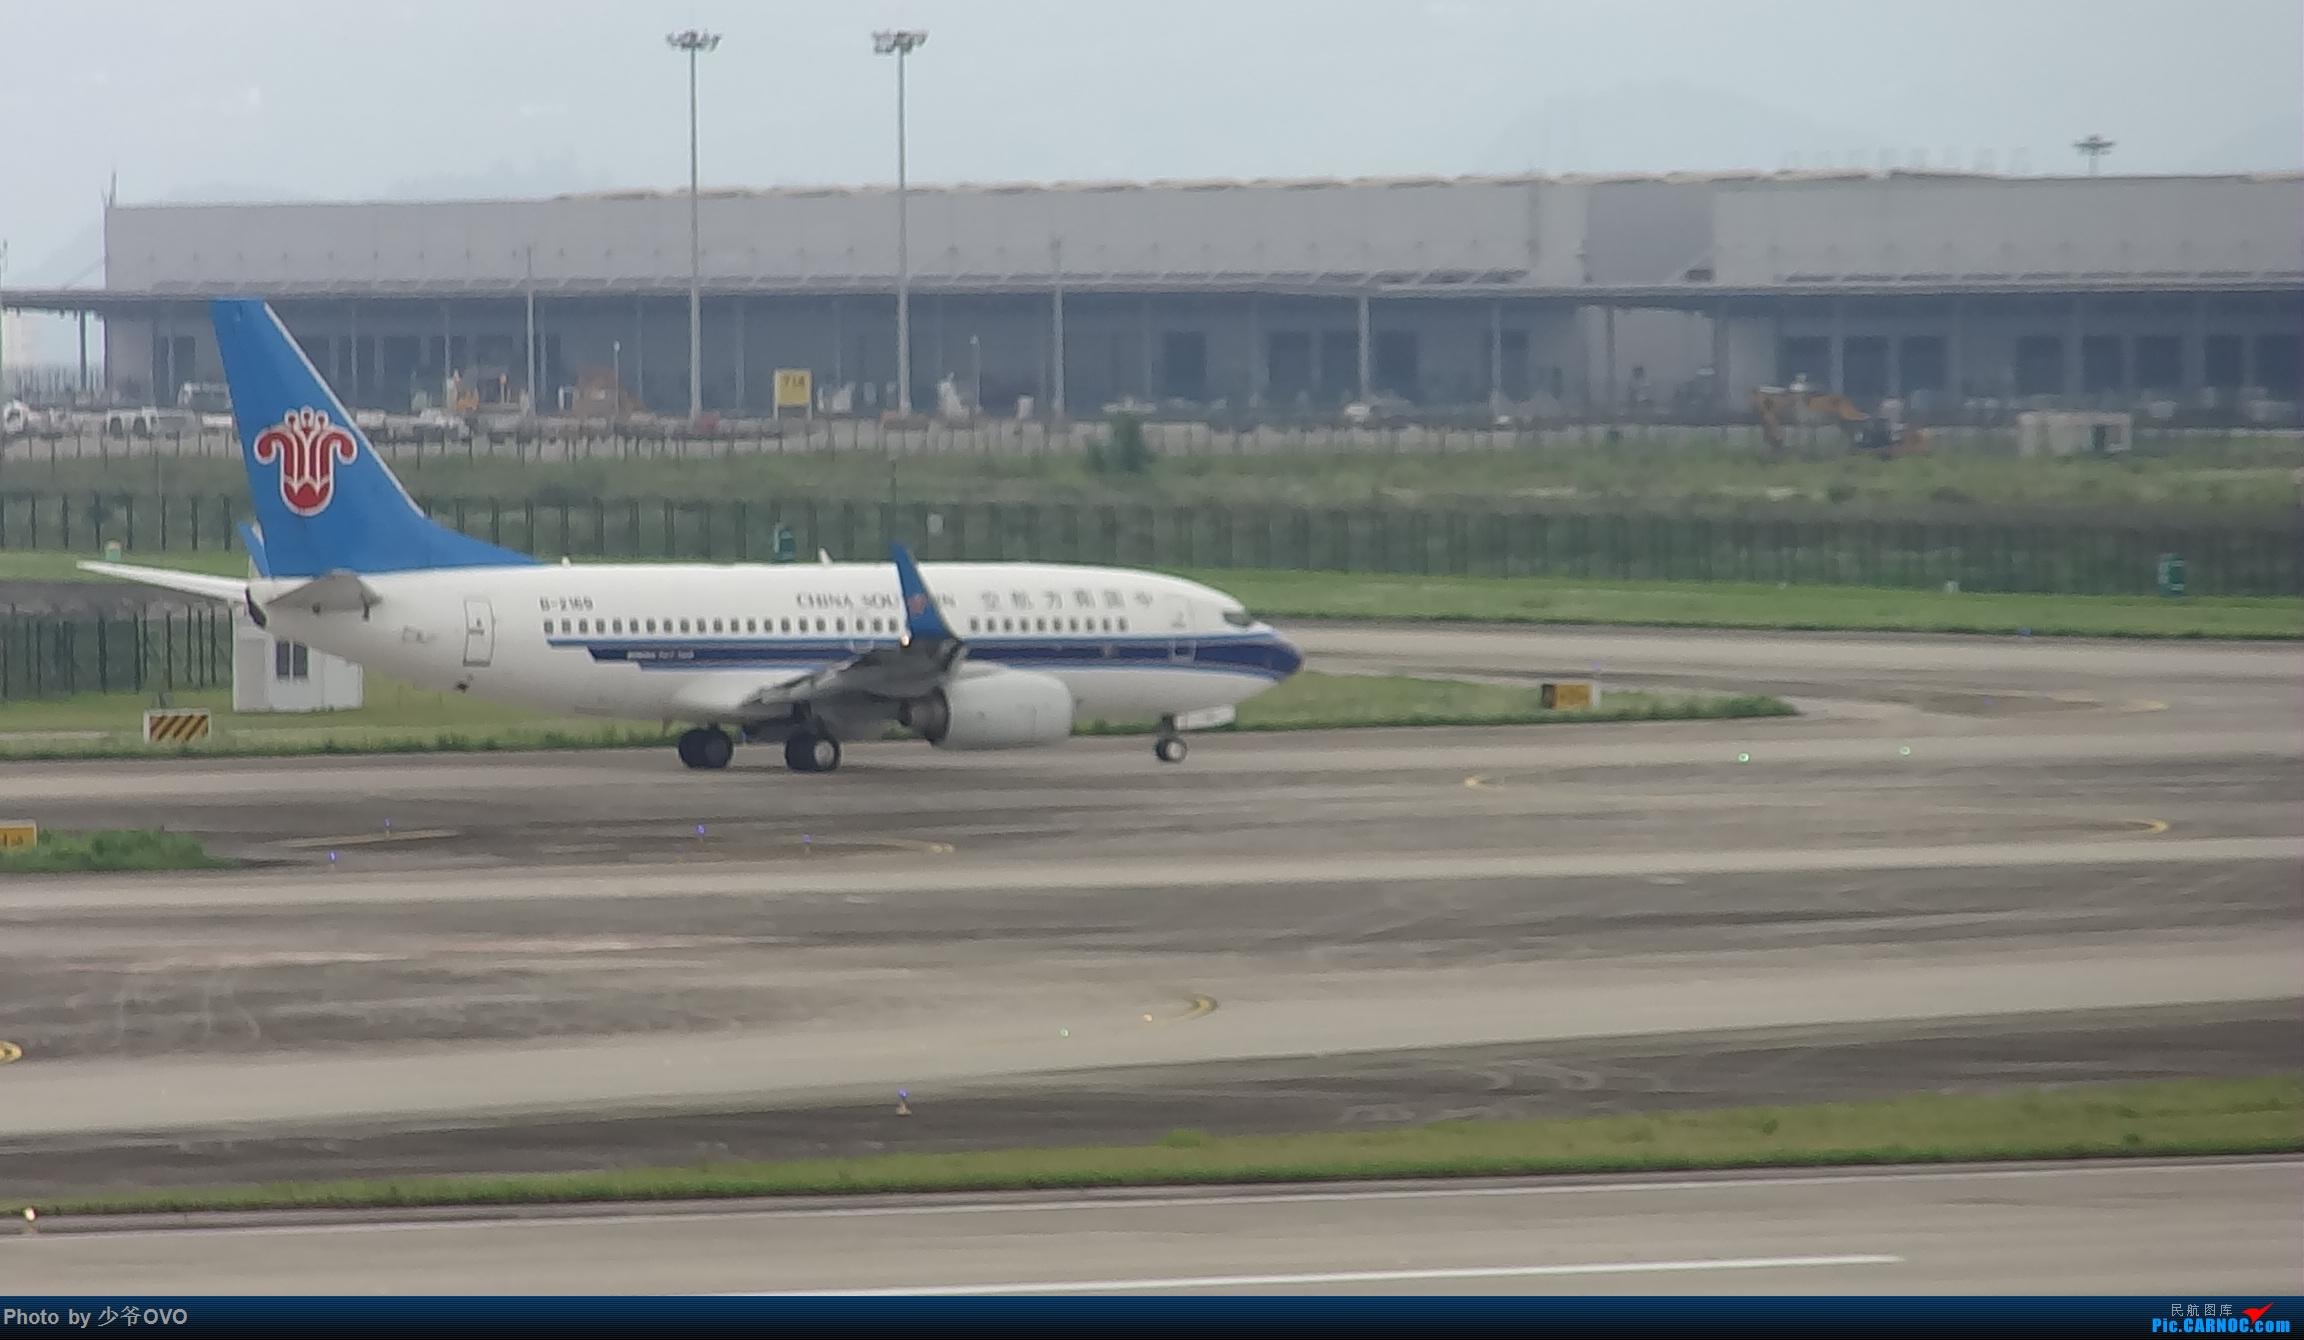 Re:[原创]CKG重庆江北机场拍机 ,中法建交50周年 BOEING 737-700 B-2169 中国重庆江北国际机场